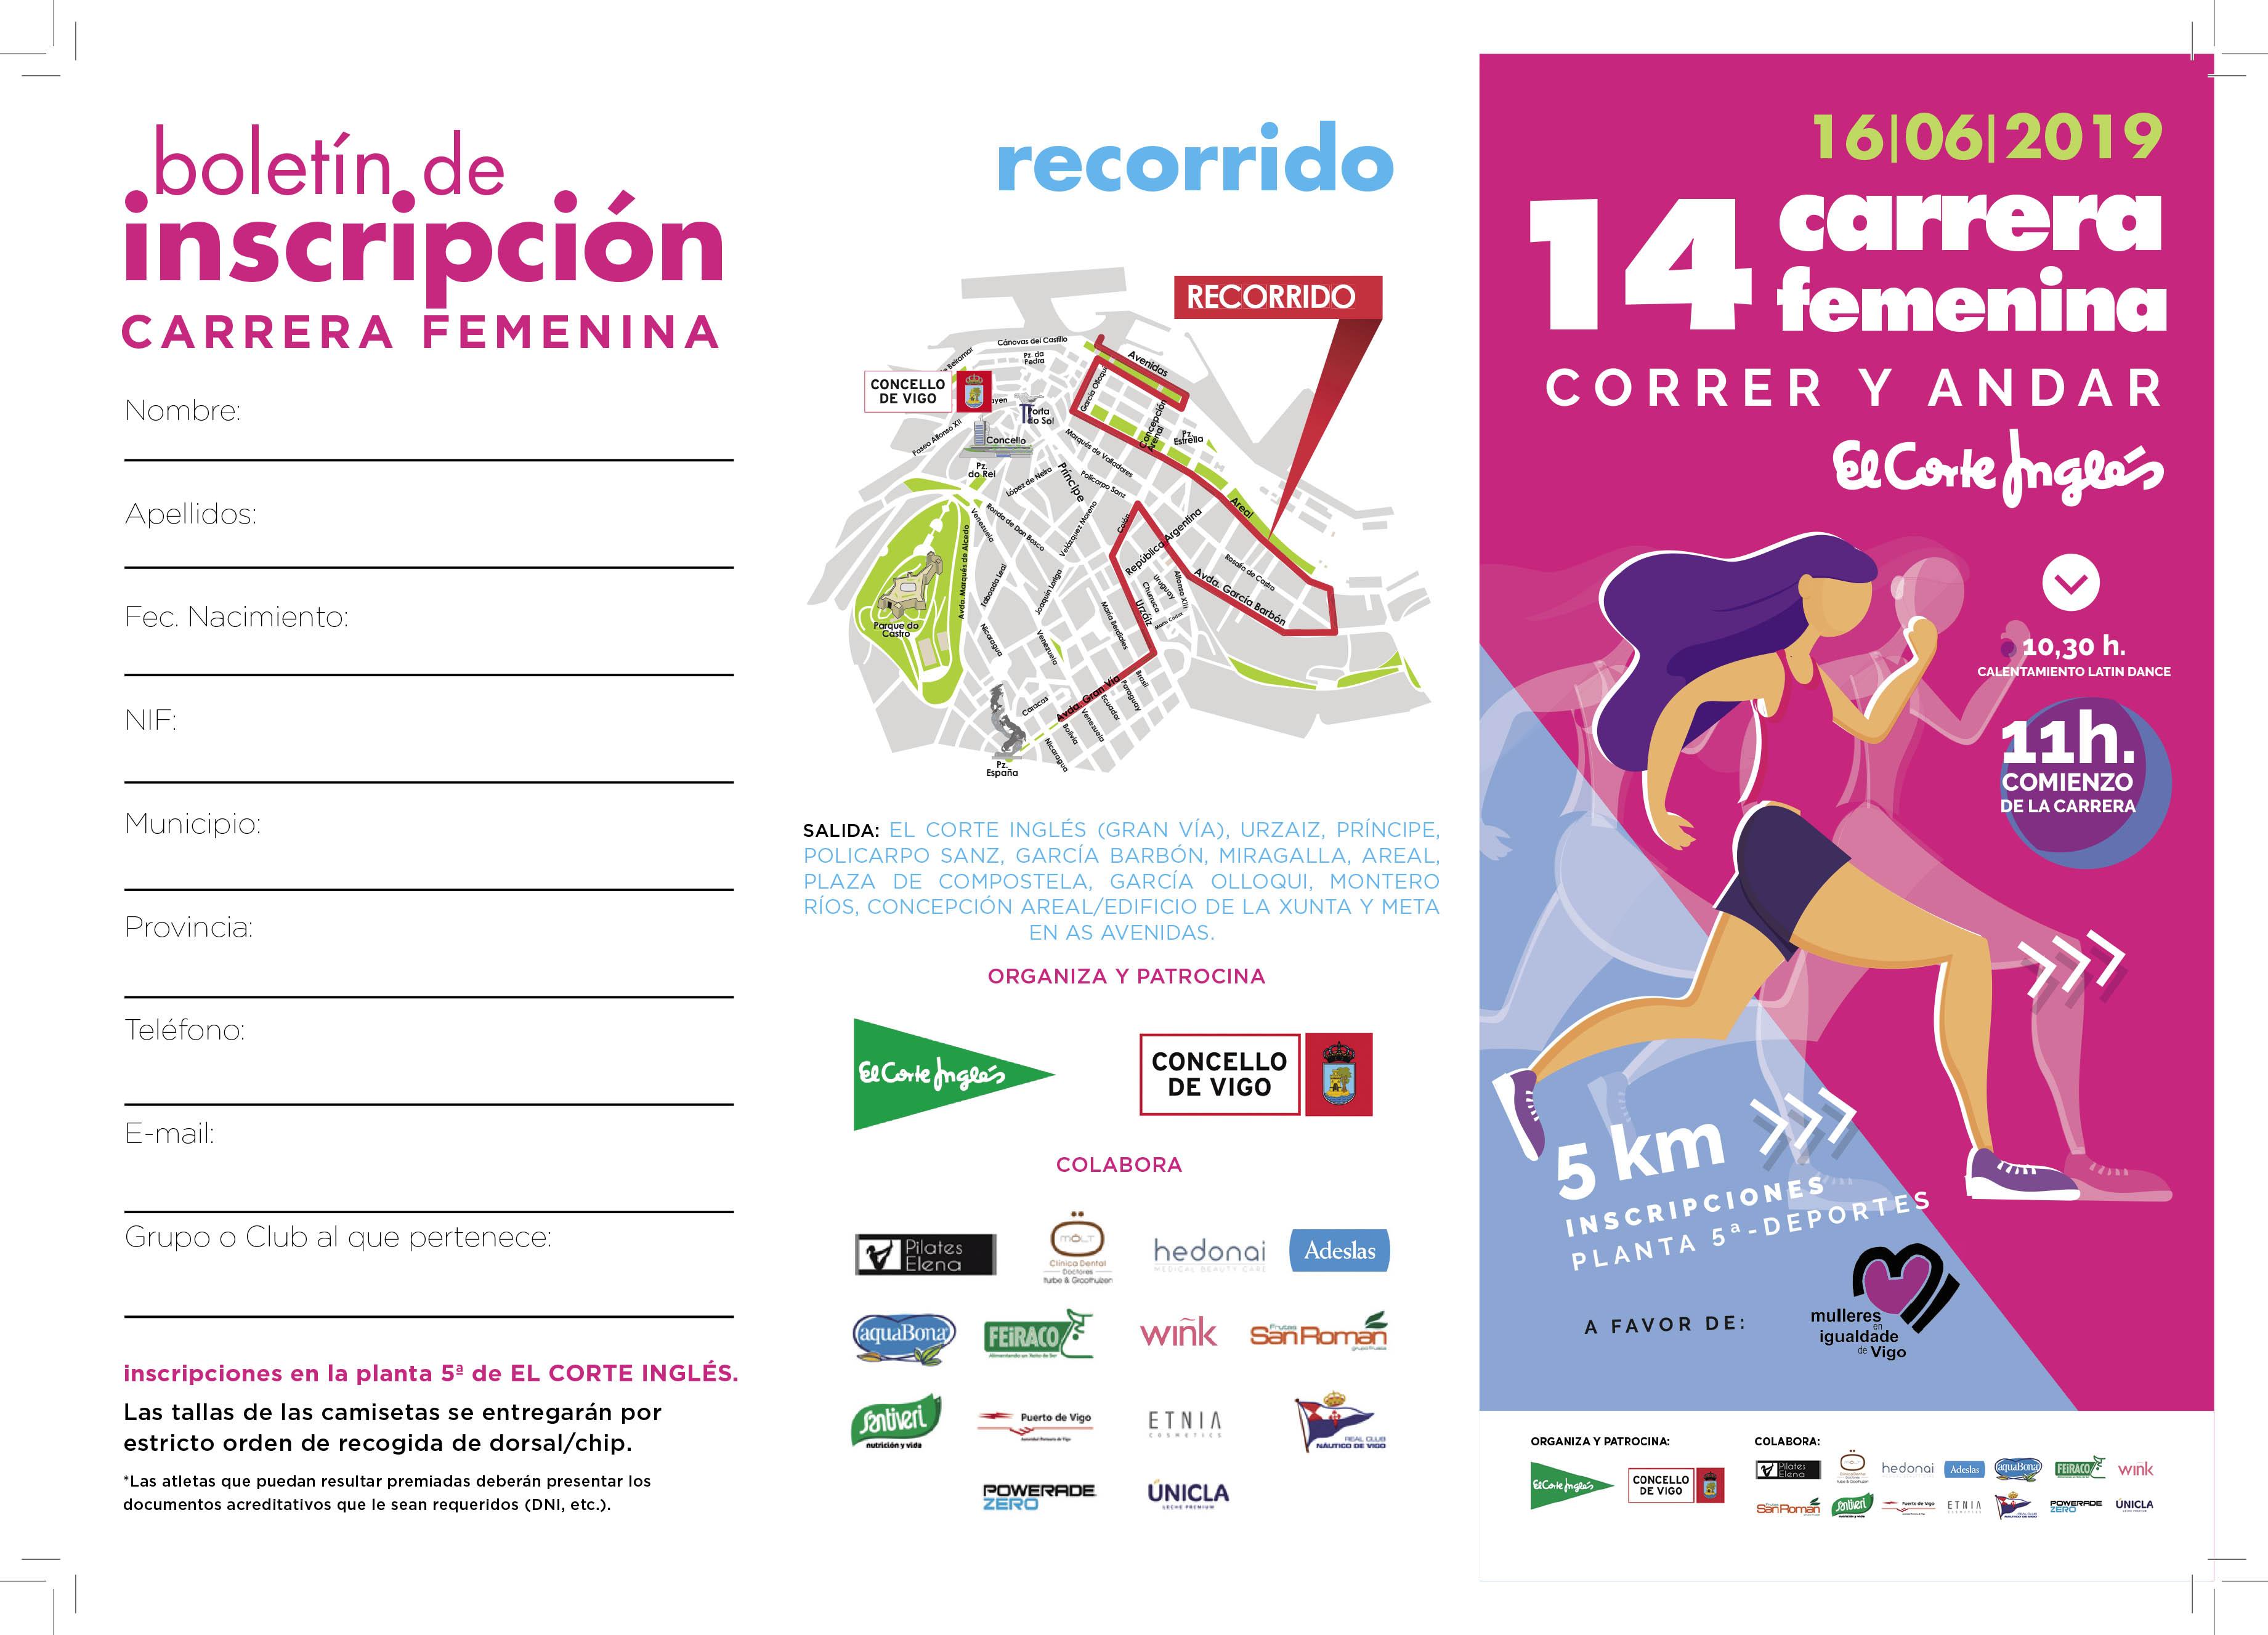 bd8cc7979f Carrera Femenina de Vigo - El Corte Ingles - laptime